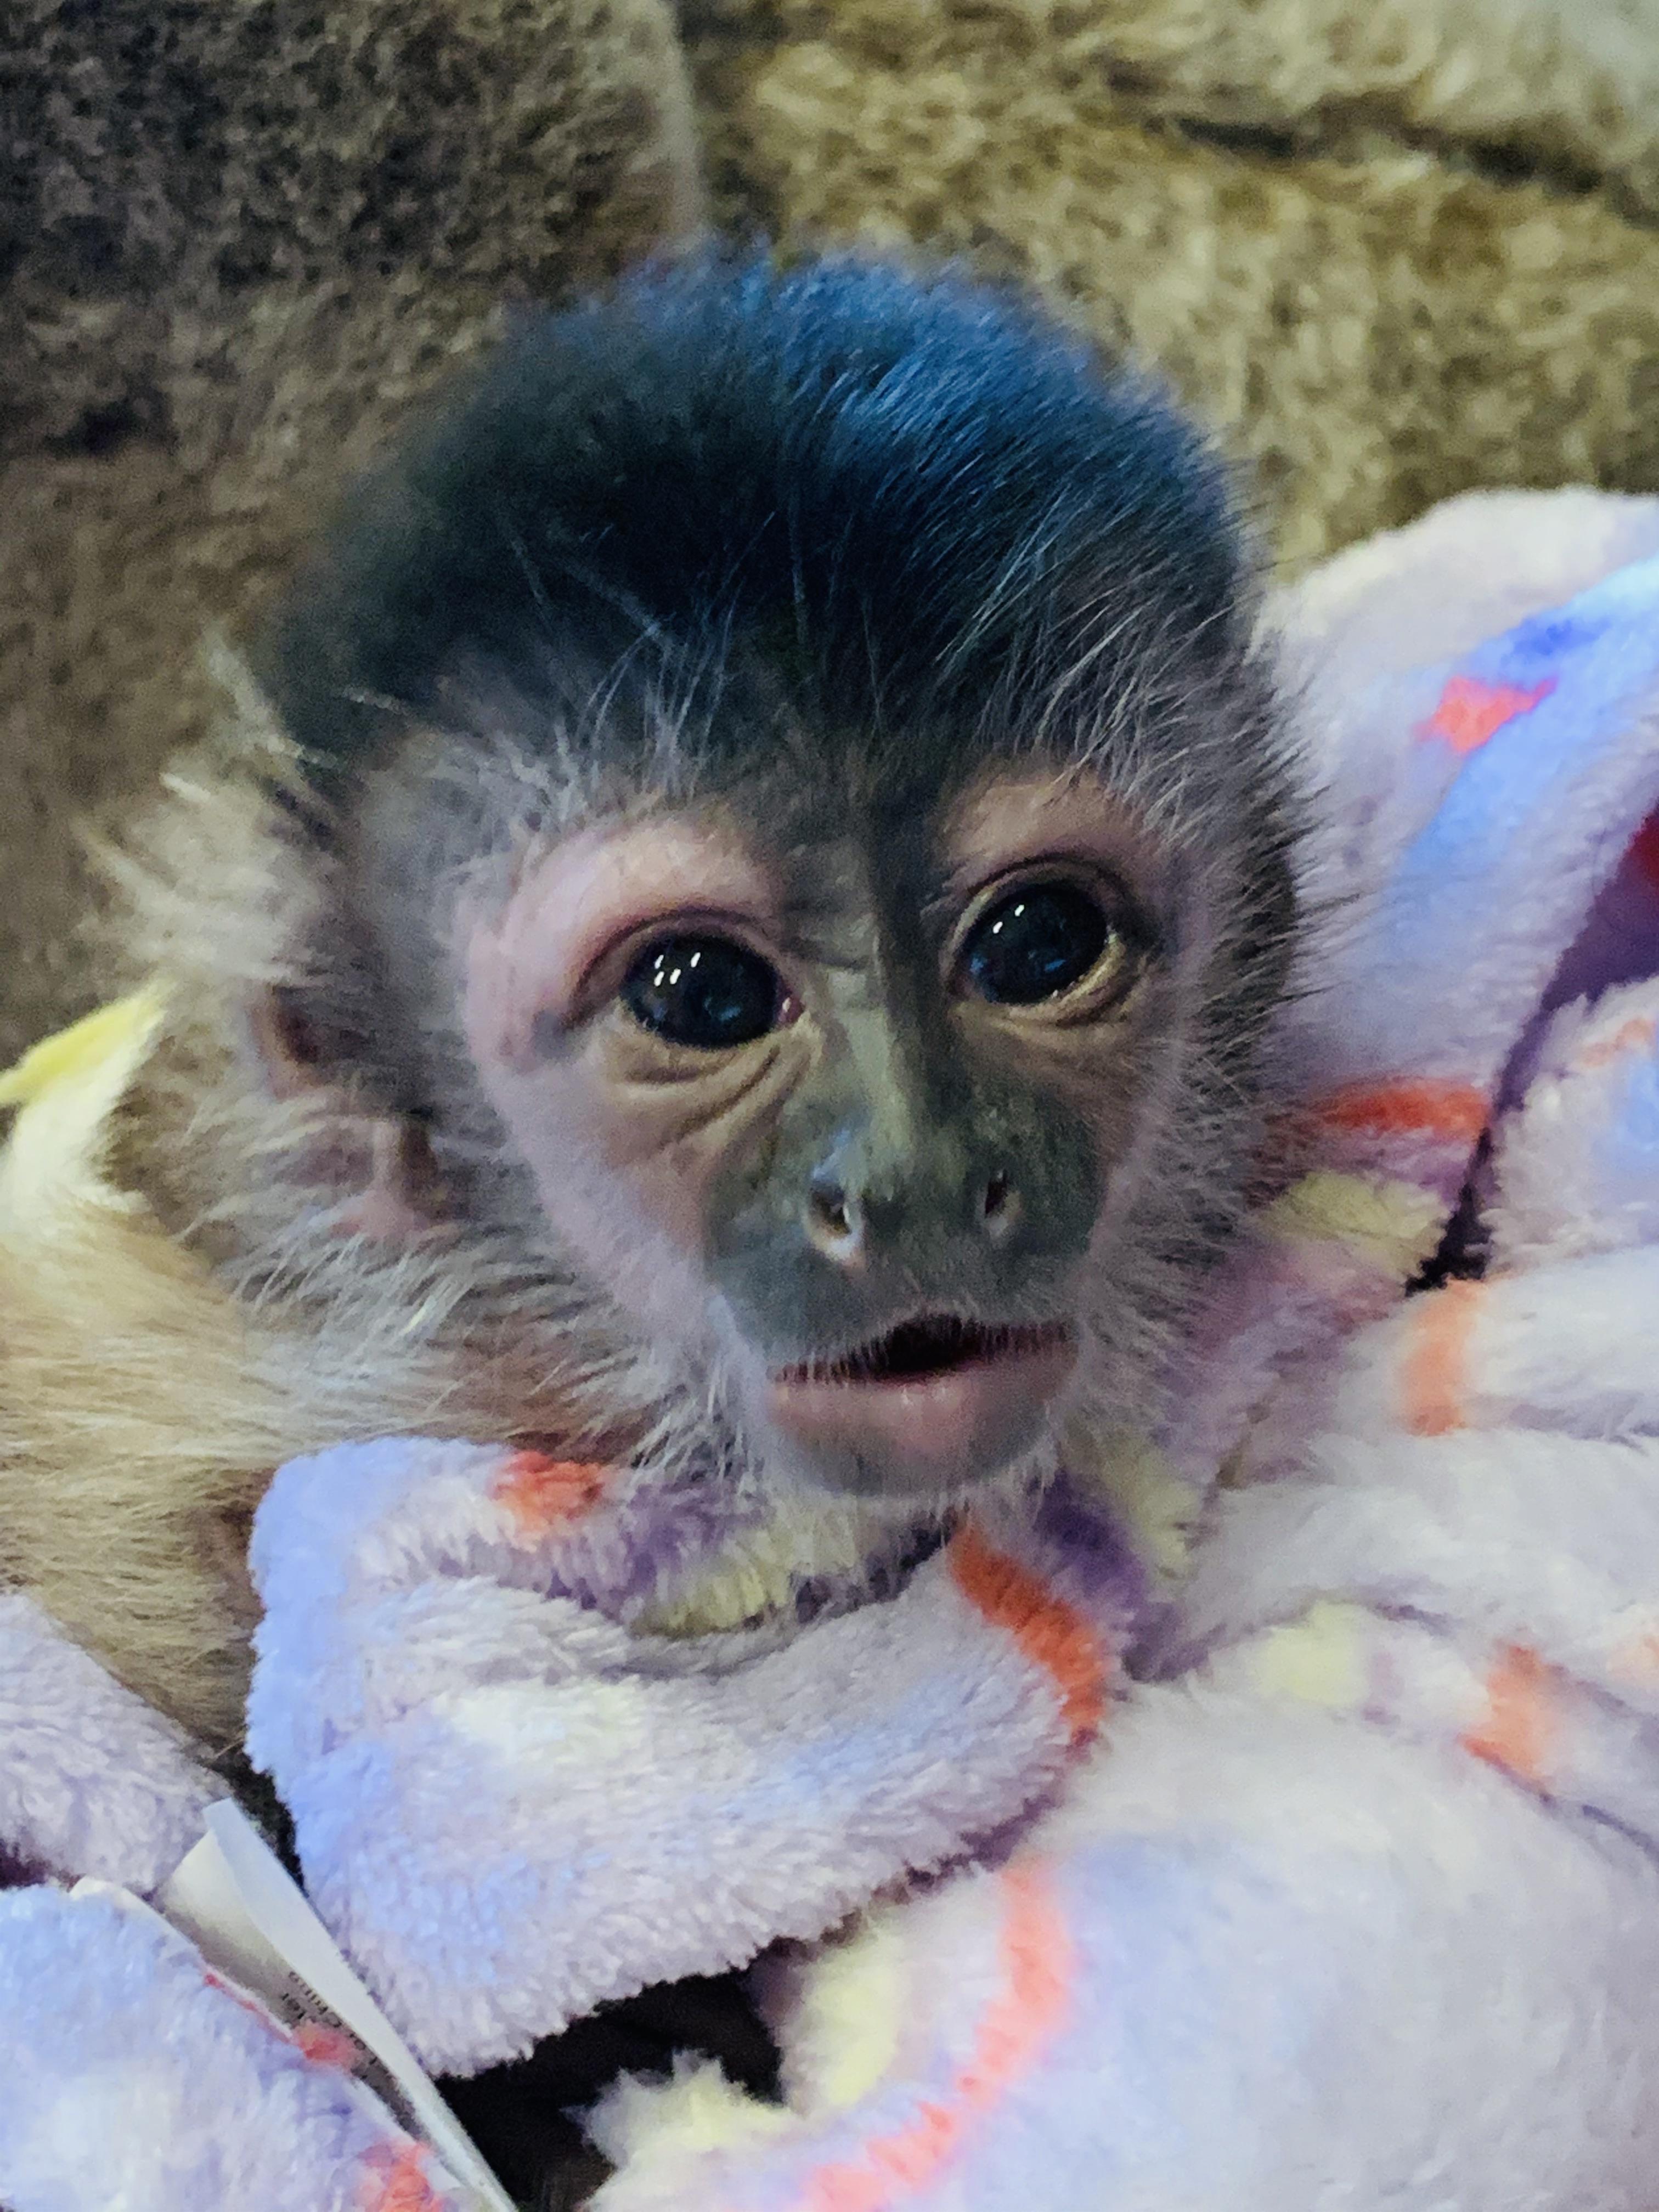 The Monkey Whisperer 6168 38th Ave N, Saint Petersburg, FL 33710 - YP.com